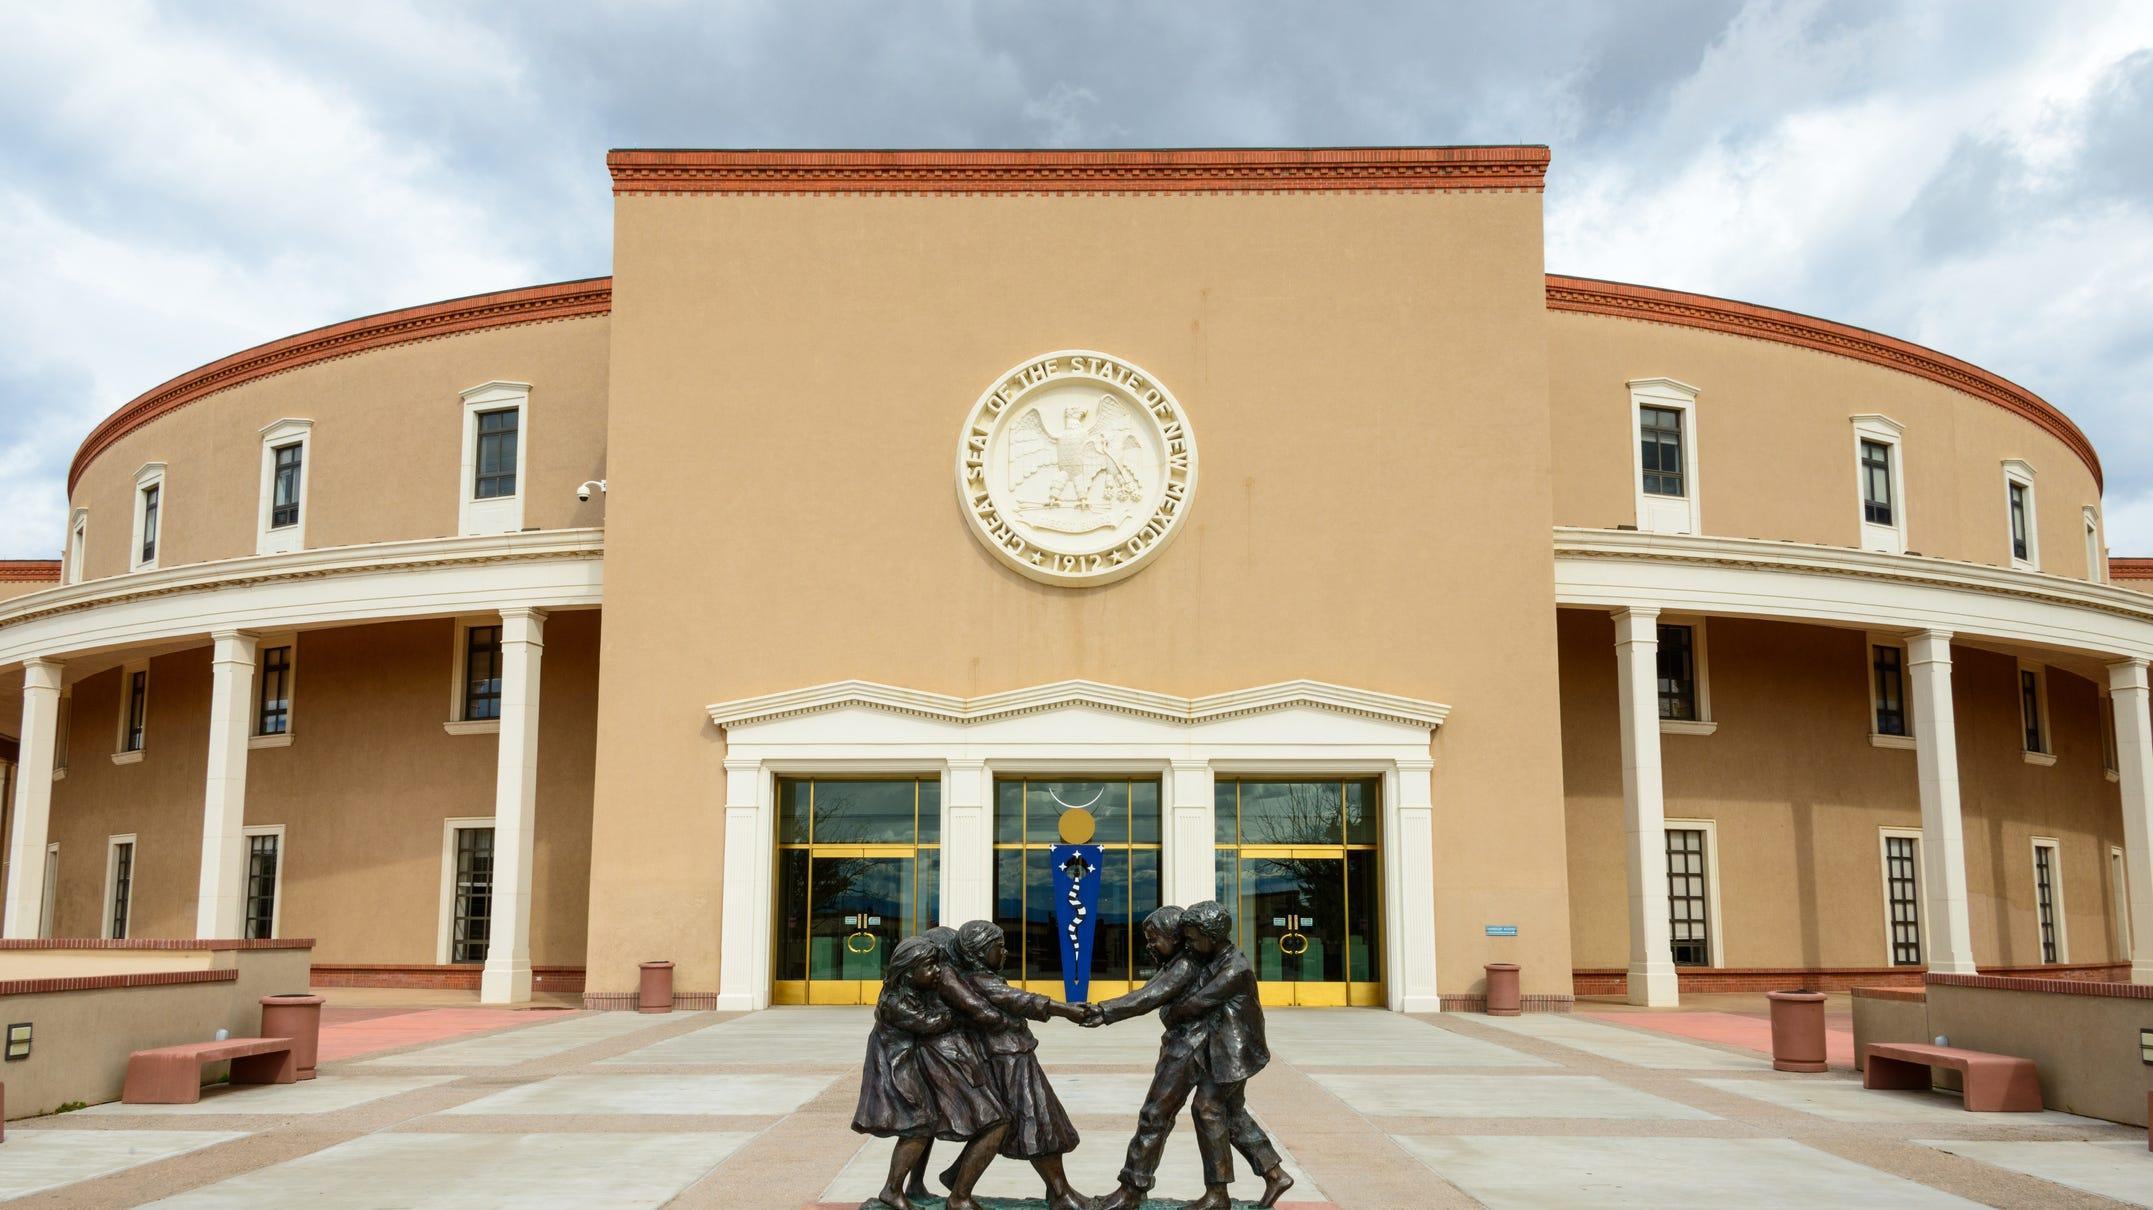 2020 NM legislature: bills filed by Otero County lawmakers